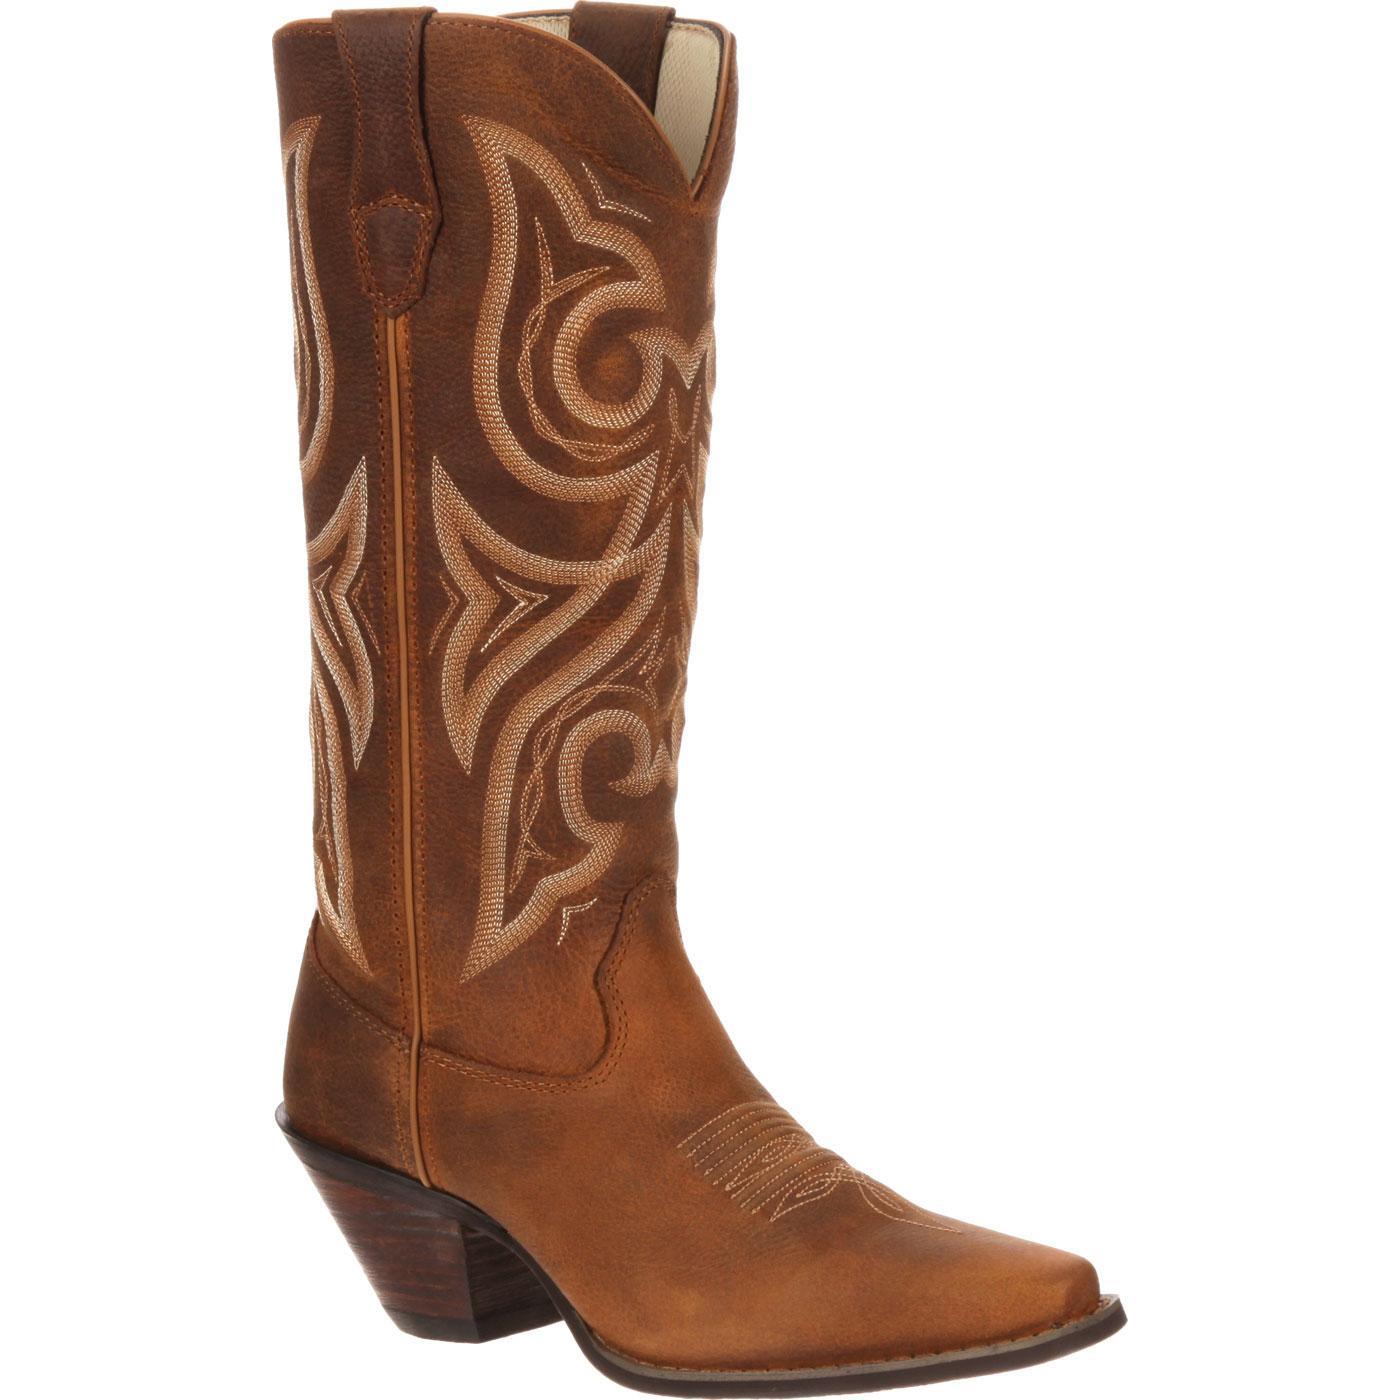 Crush by Durango Women's Tan Jealousy Western Boot, , large